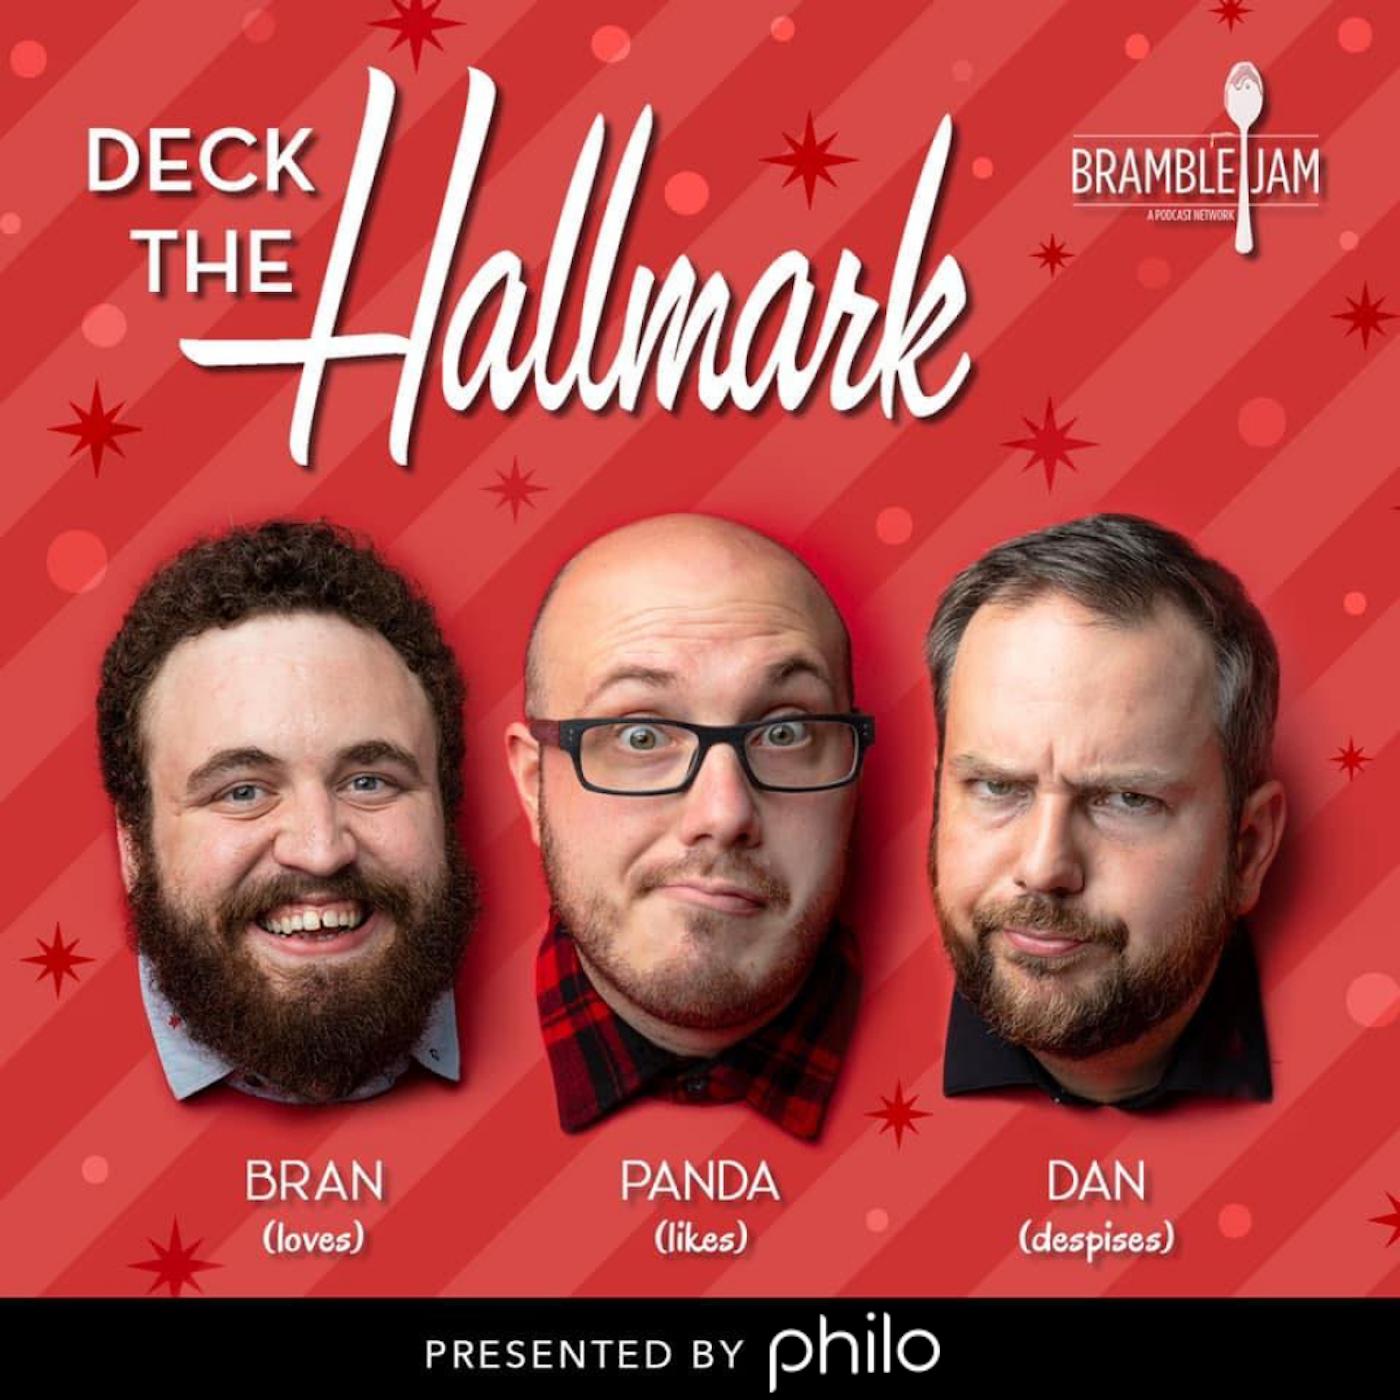 Deck The Hallmark